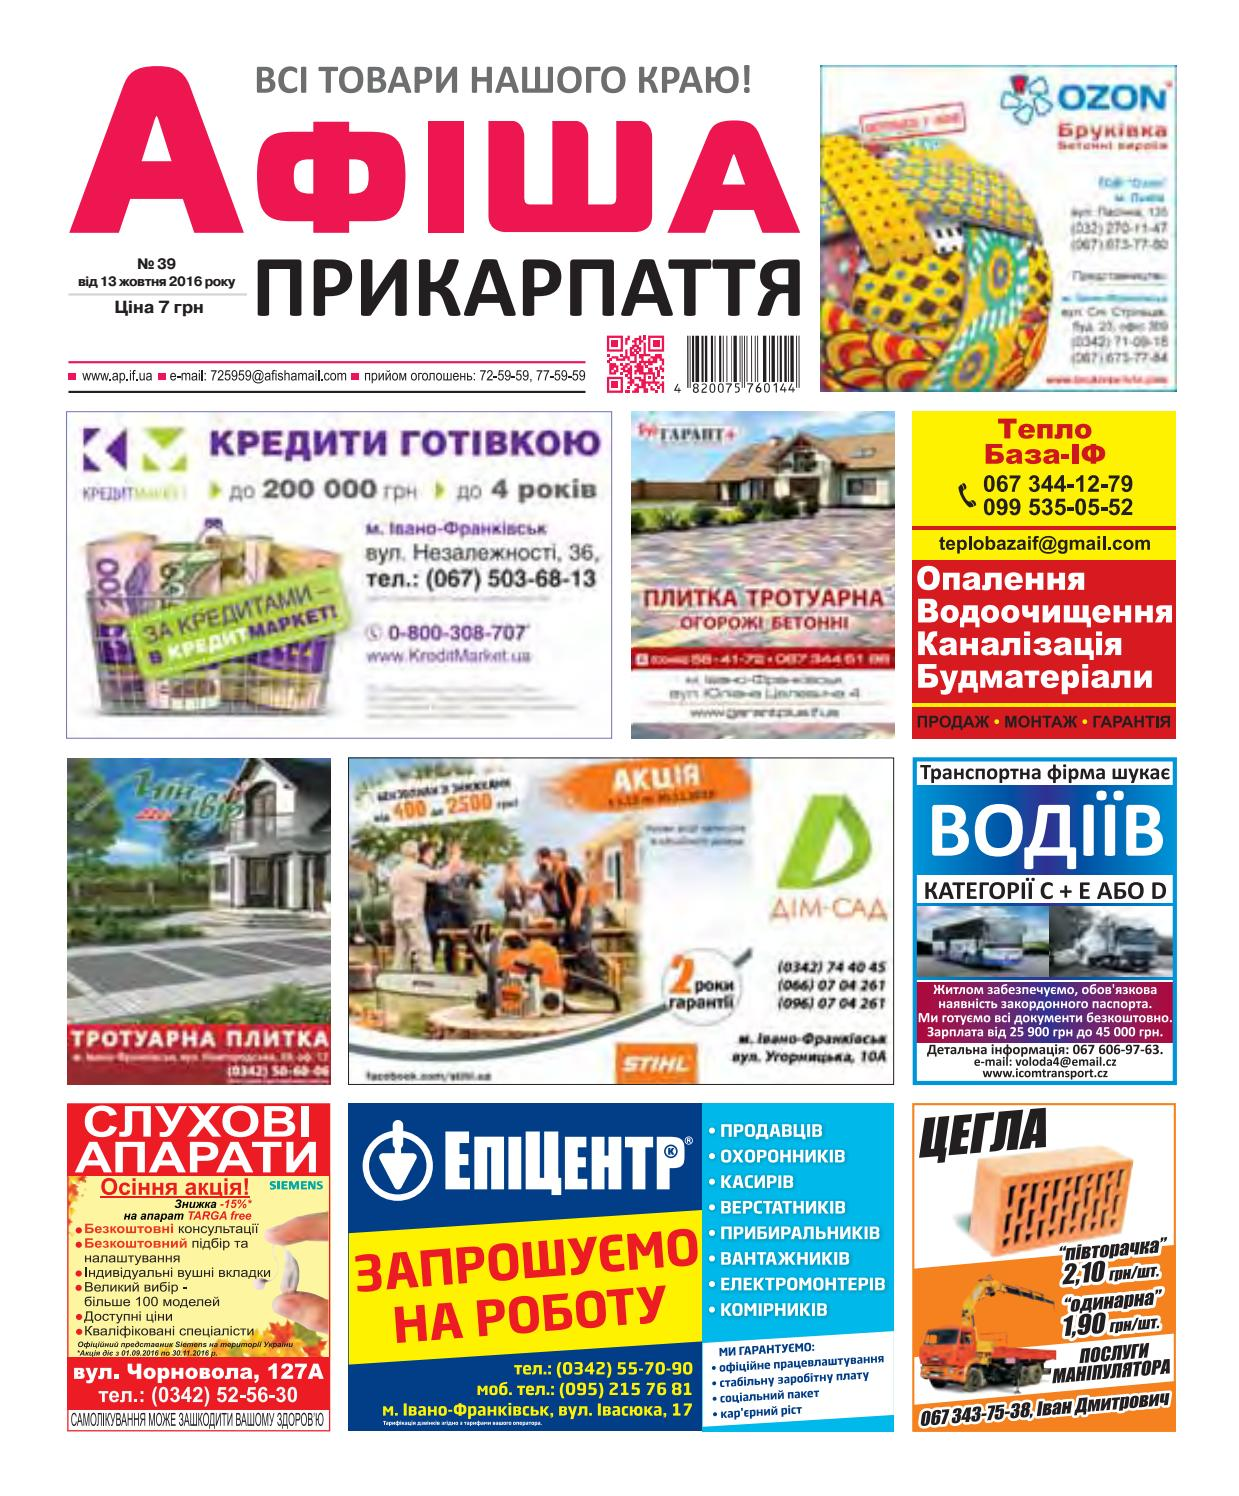 Афіша Прикарпаття №39 by Olya Olya - issuu 89a2255f4d93b